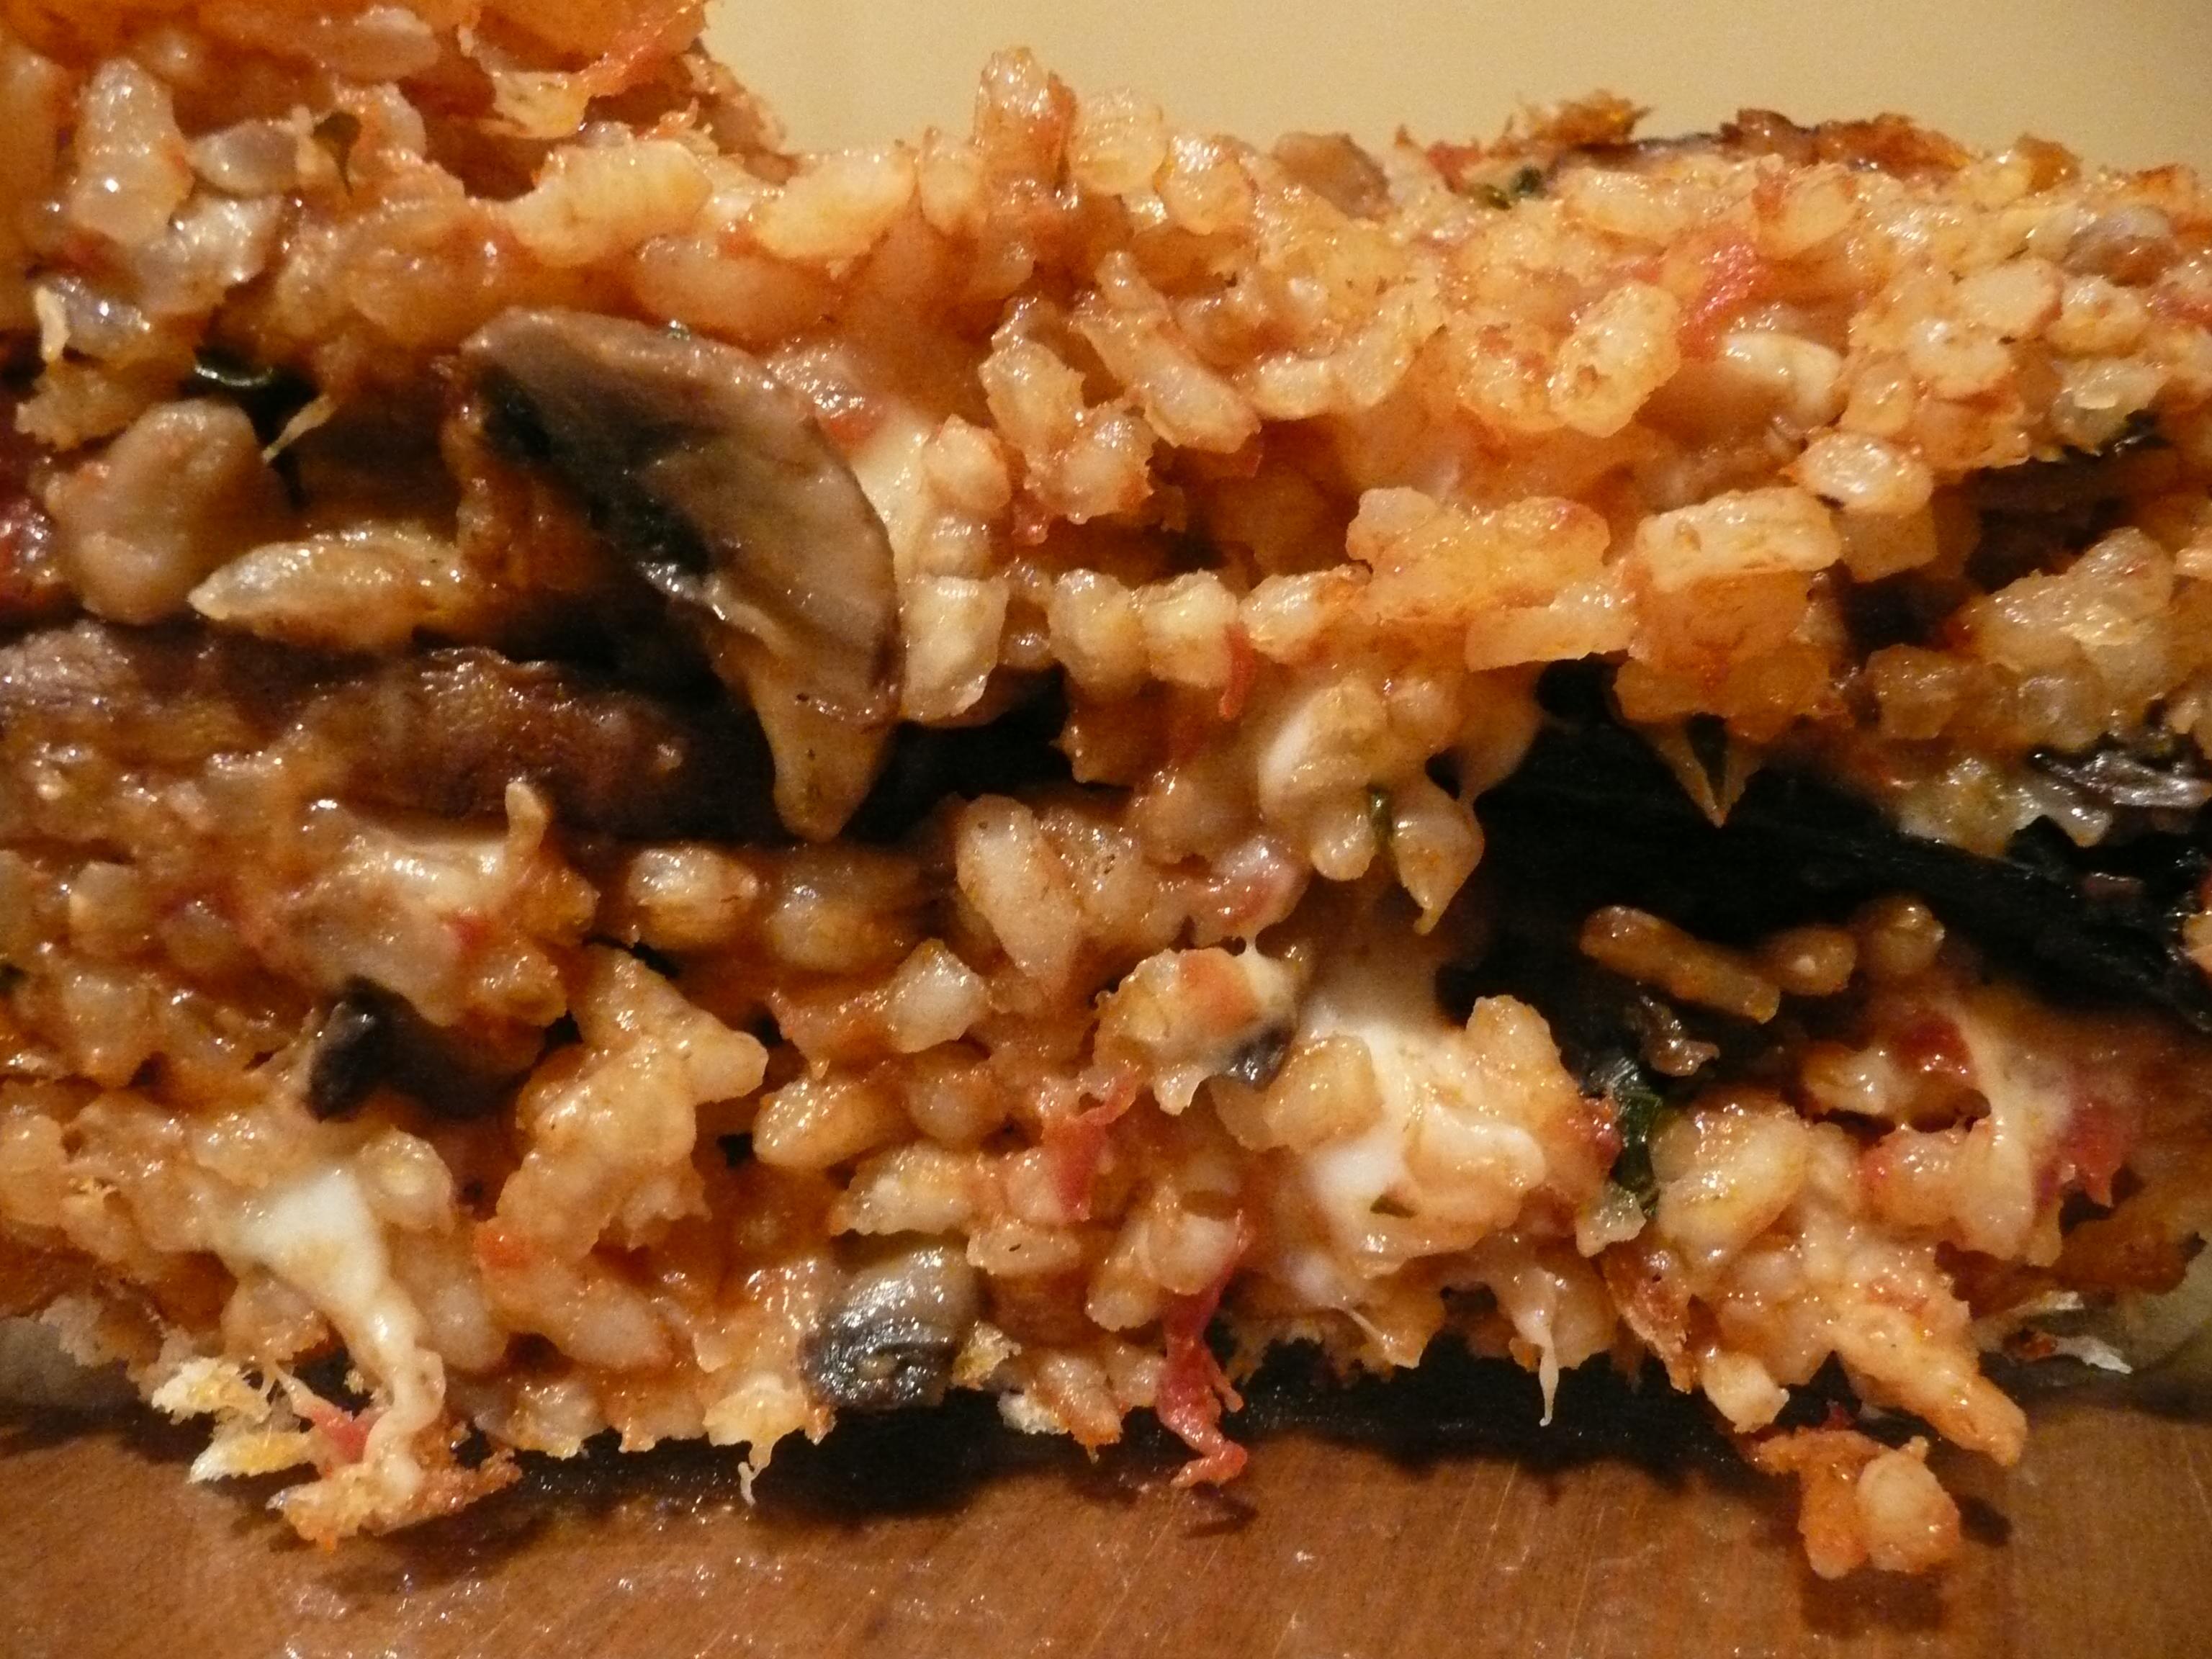 Torta di risotto with char-grilled Portobello mushrooms and three cheeses